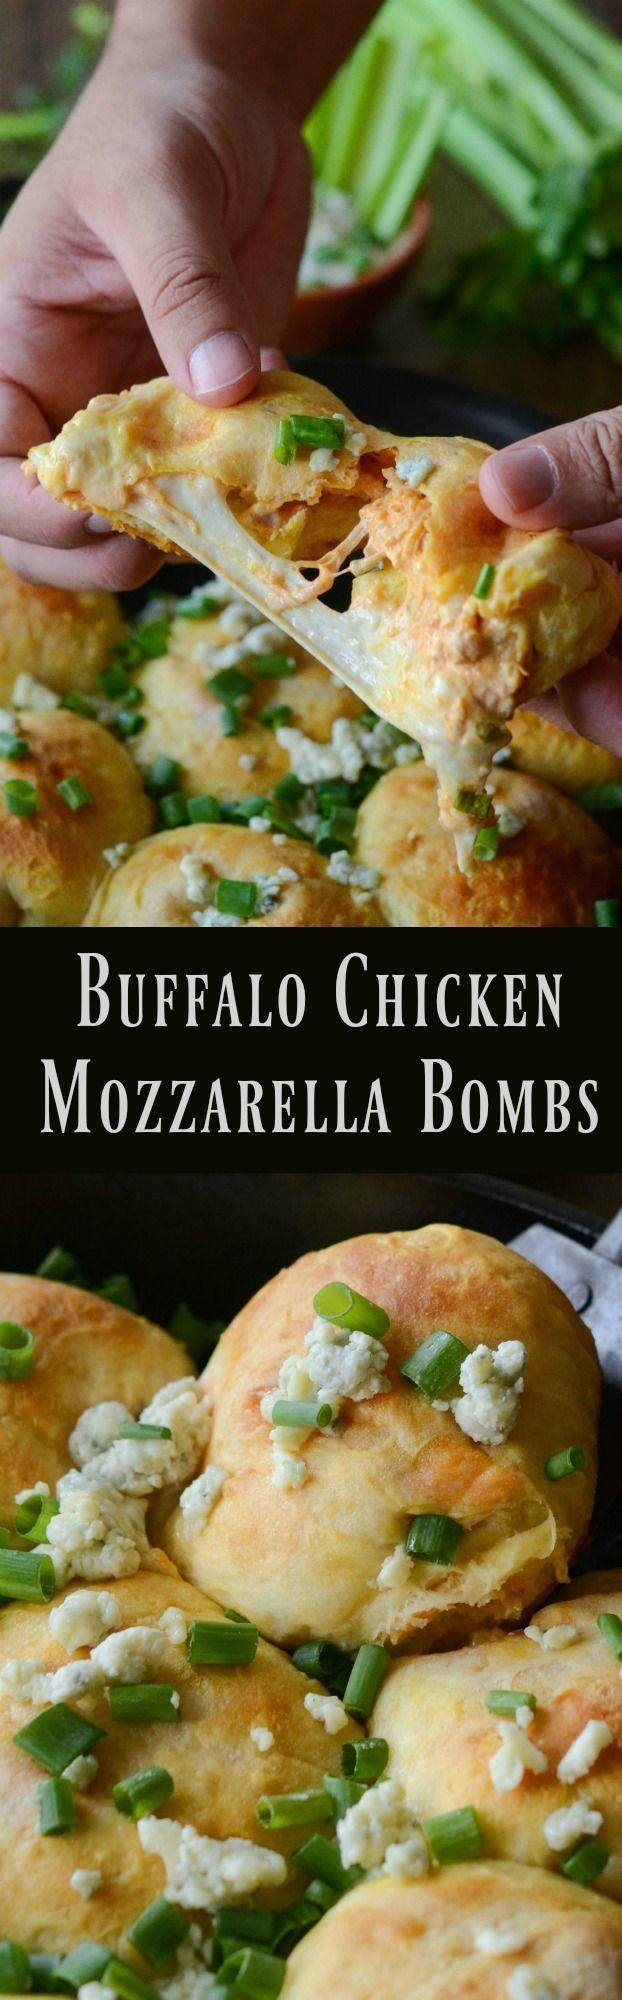 Buffalo Chicken Mozzarella Bombs: biscuit dough is stuffed with buffalo chicken, blue cheese and fresh mozzarella!